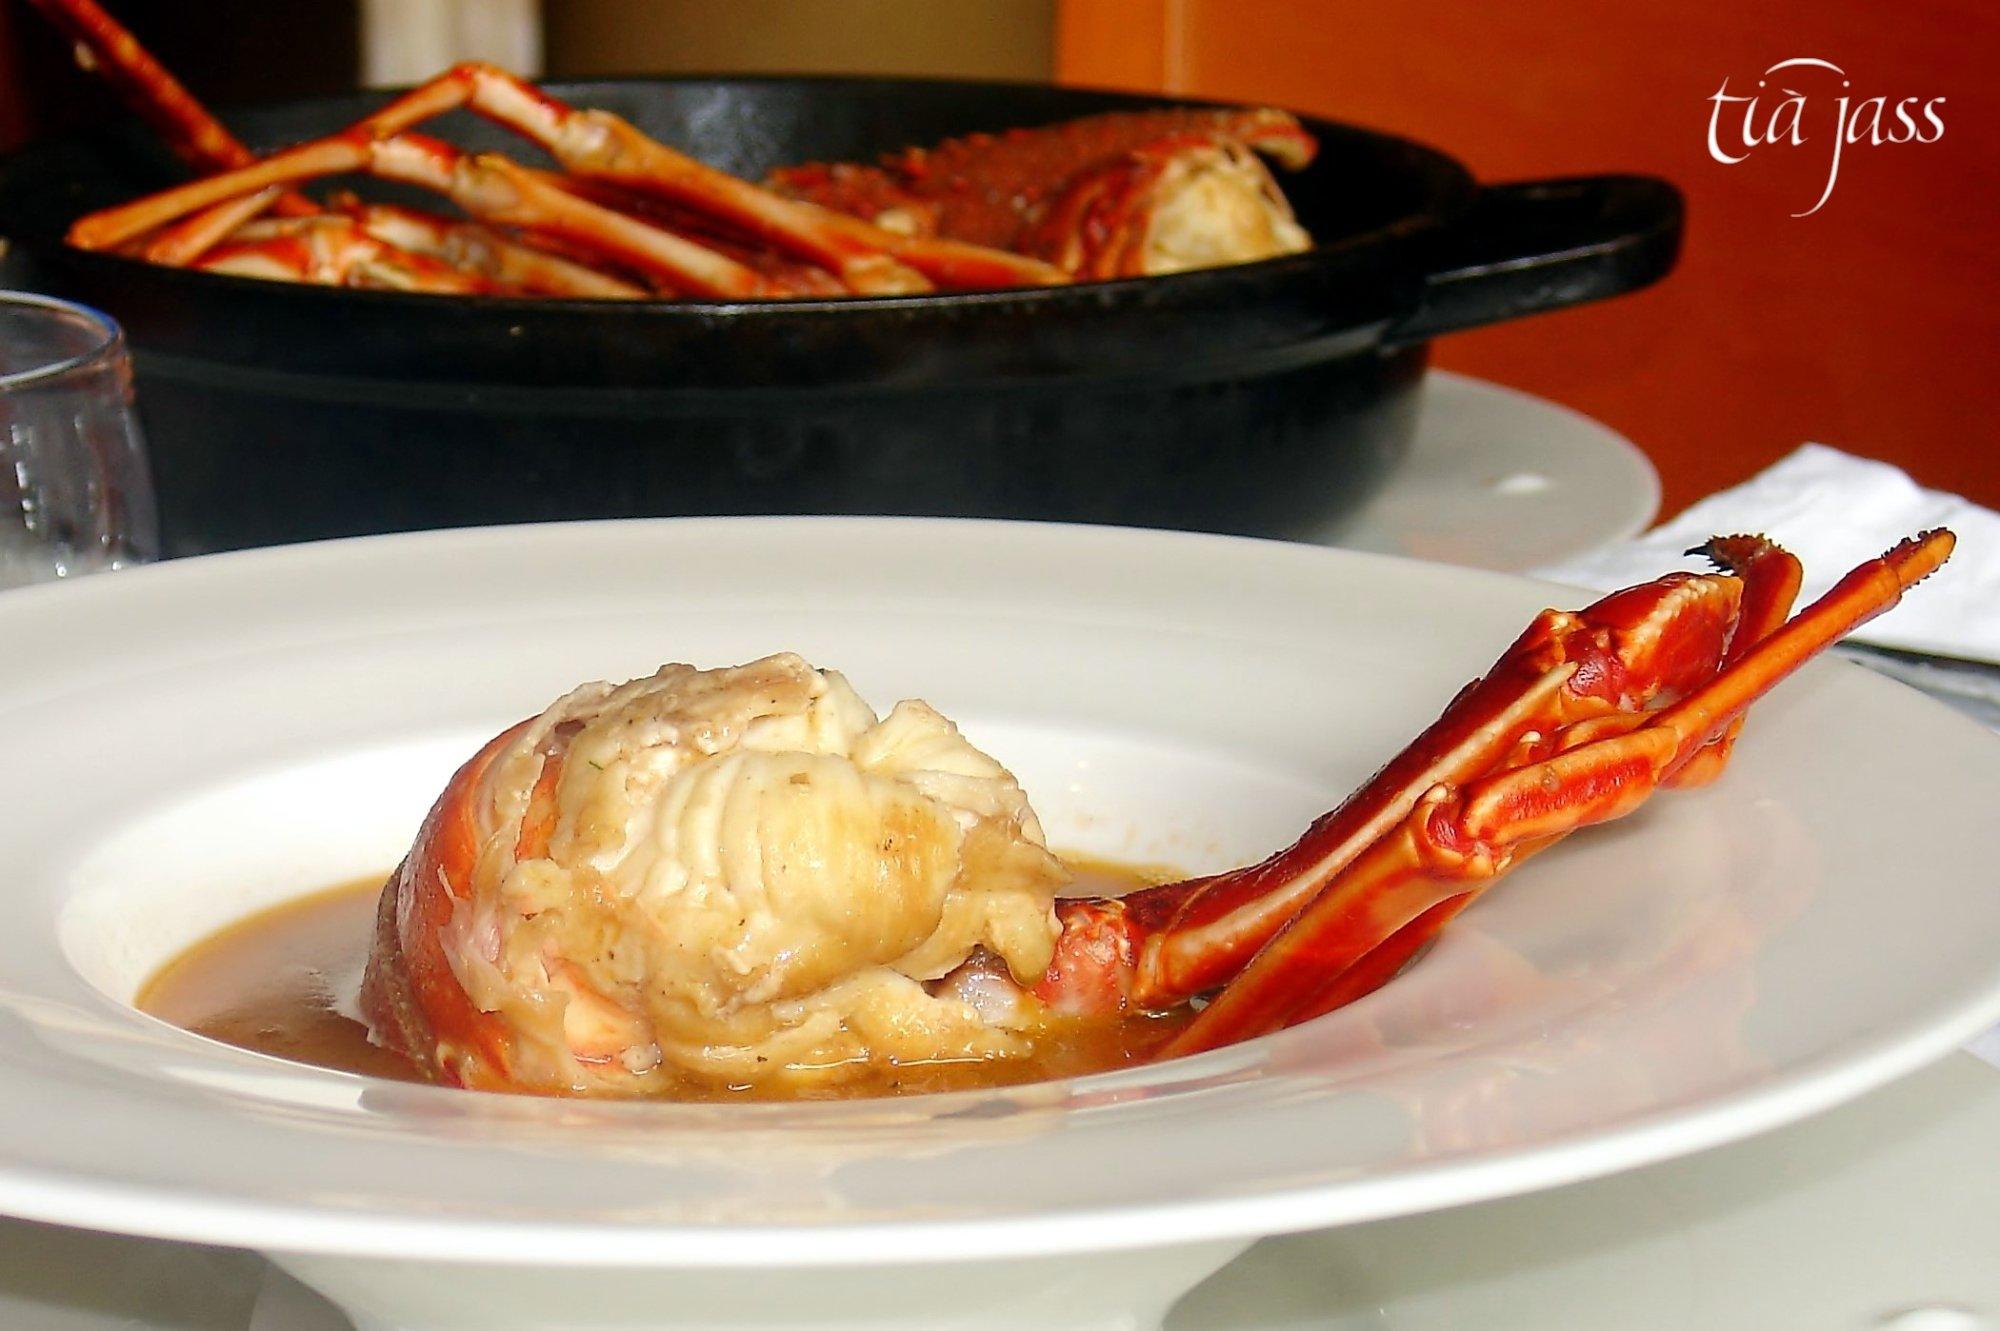 Spain Food Guide: 5 Barbecue food Must-Eat Restaurants & Street Food Stalls in Costa De Los Pinos